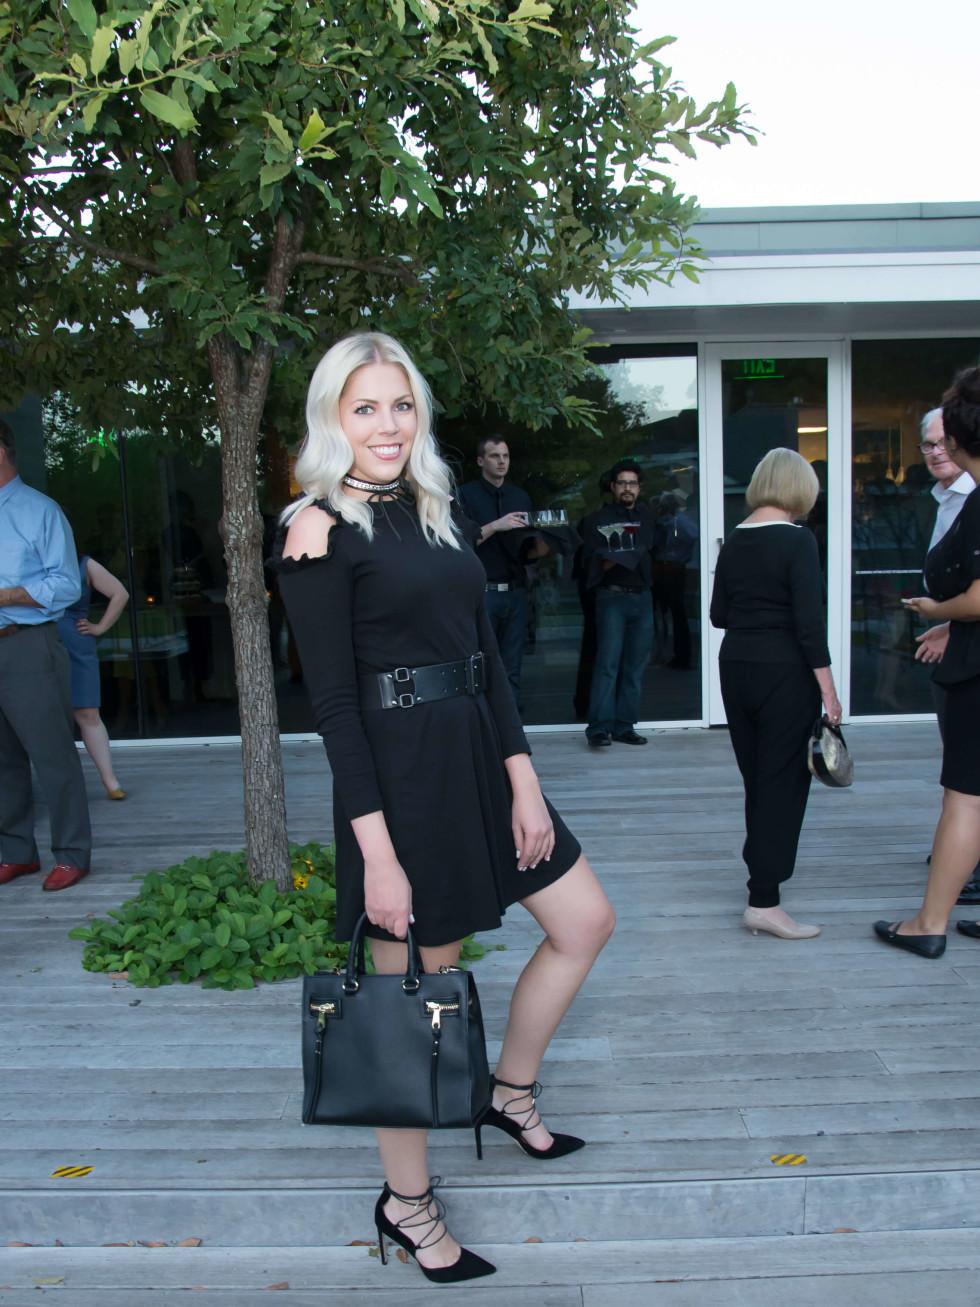 PaperCity launch party, 9/16, Meagan Thomason